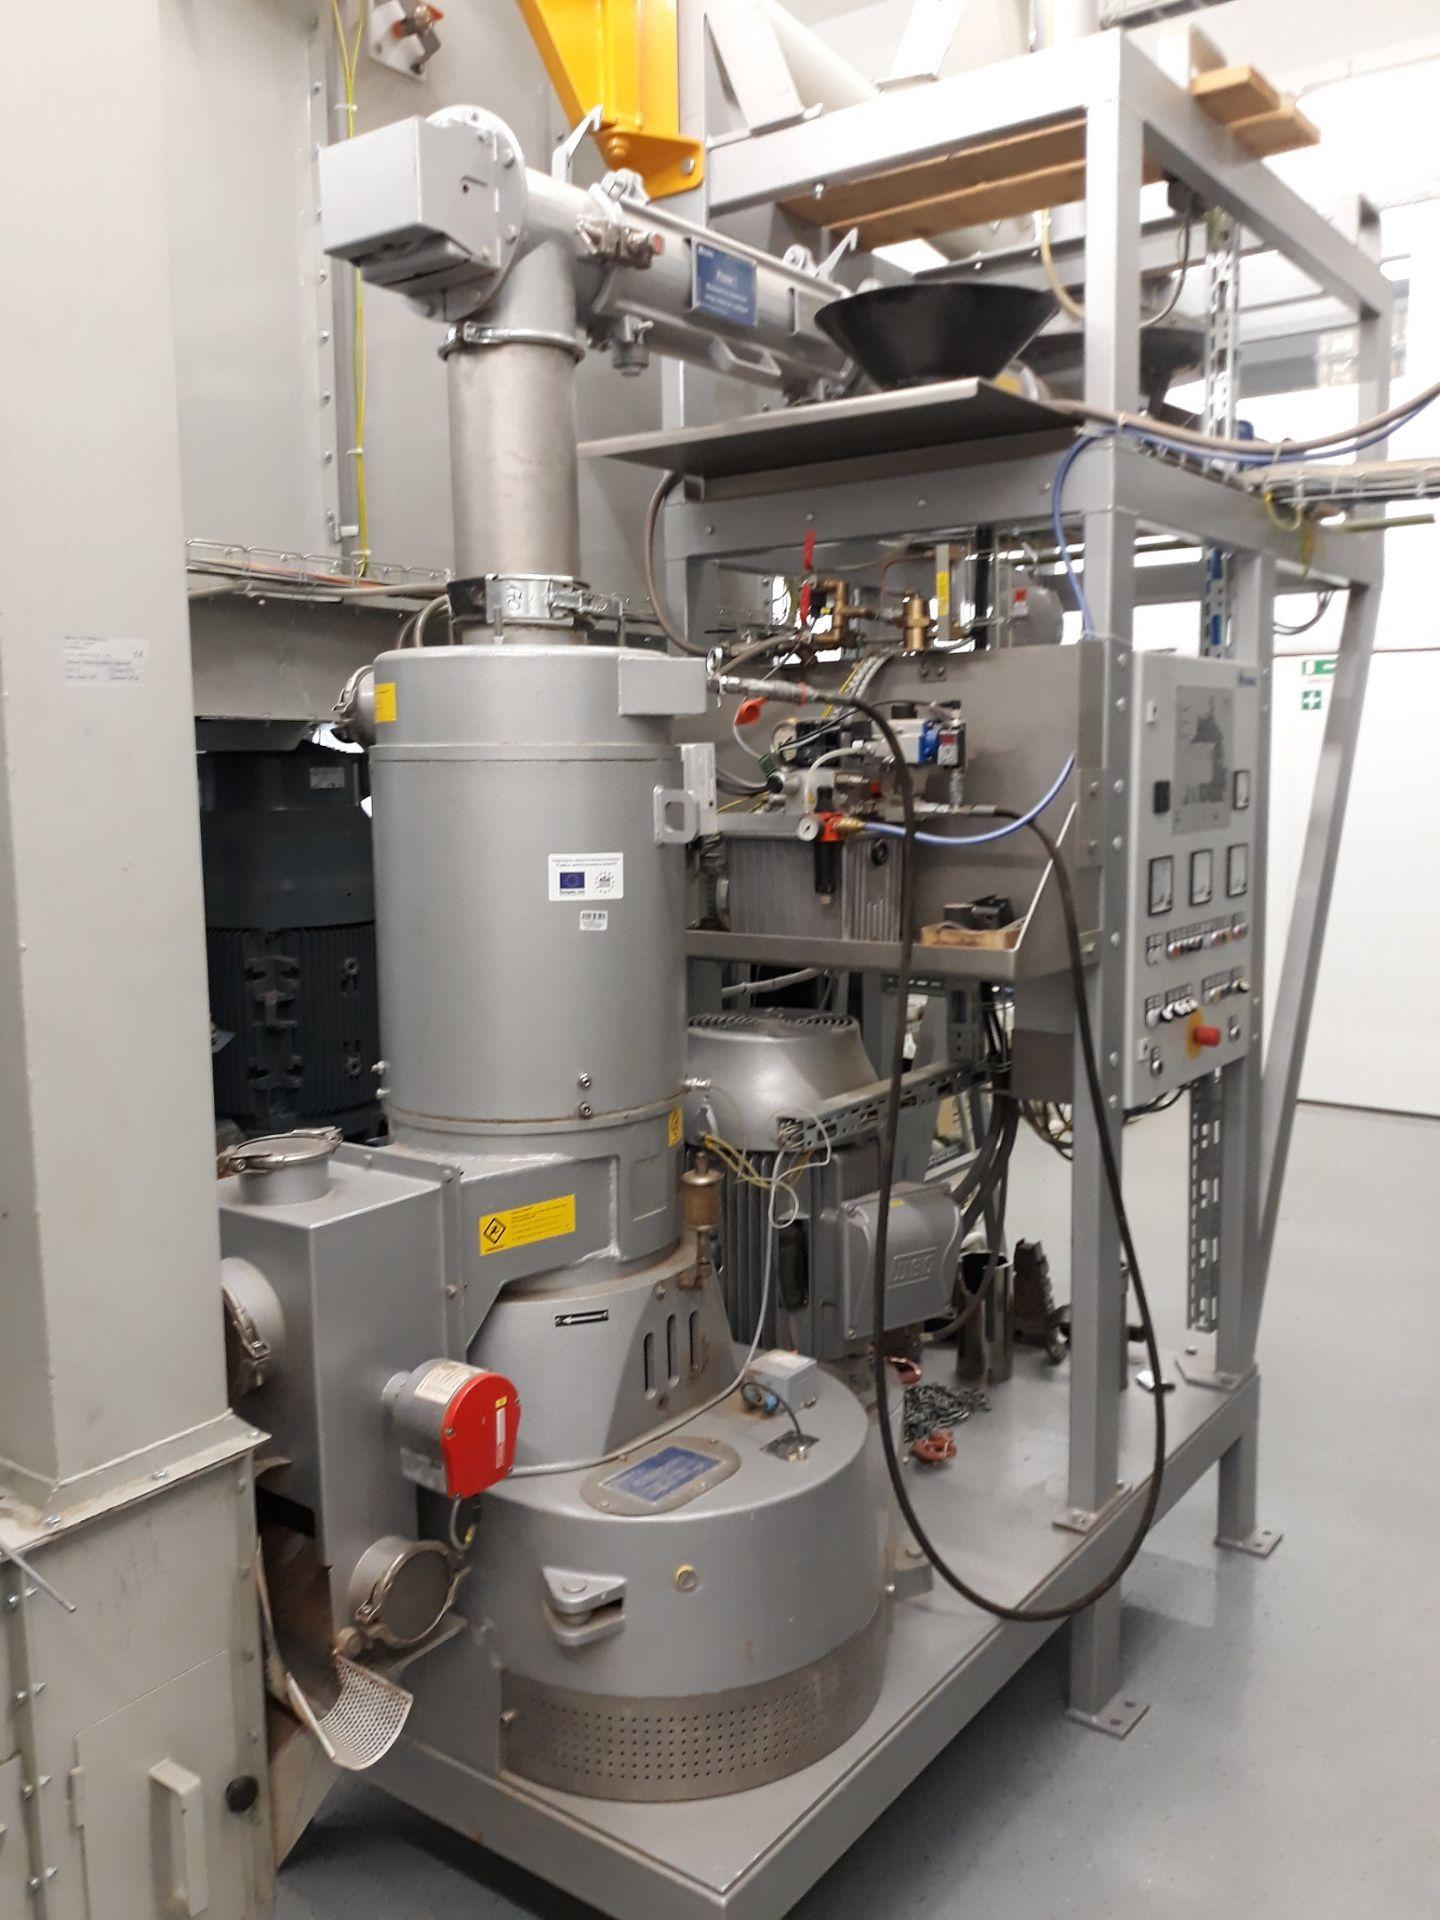 Toto laboratórium je na Slovensku unikát.